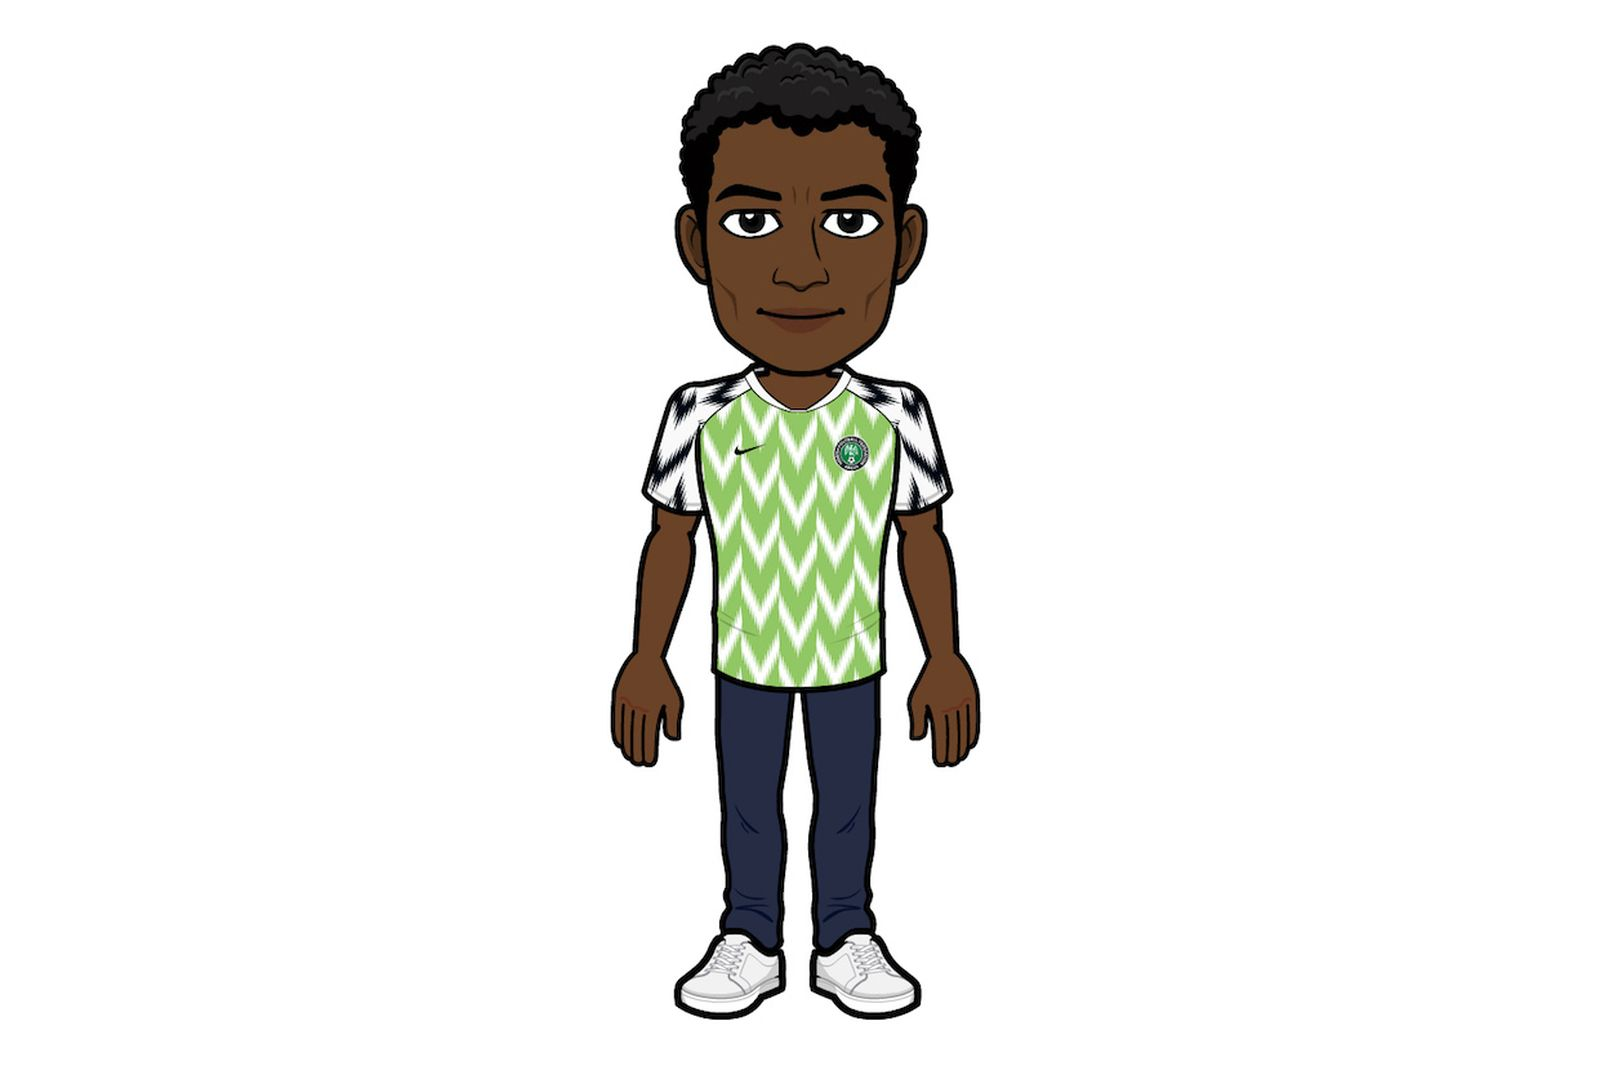 bitmoji world cup kits 2018 FIFA World Cup Adidas Nike